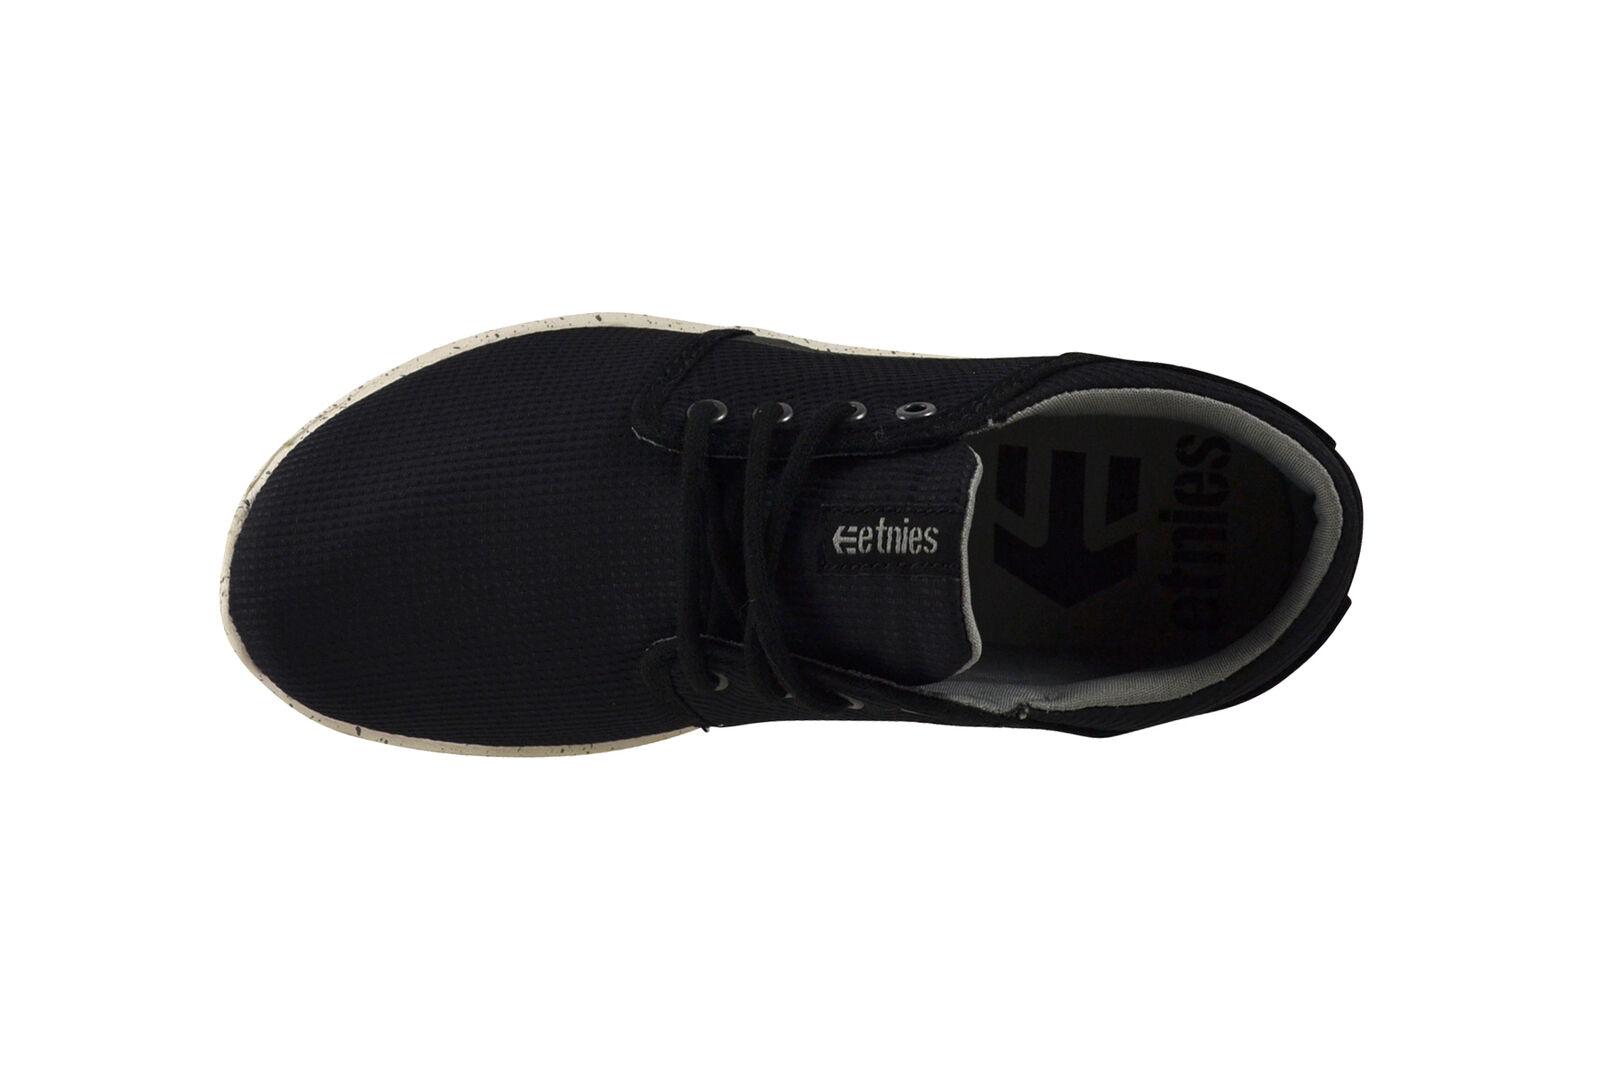 Etnies Scout schwarz Grau Grau schwarz Sneaker Schuhe schwarz Grau dfc26c